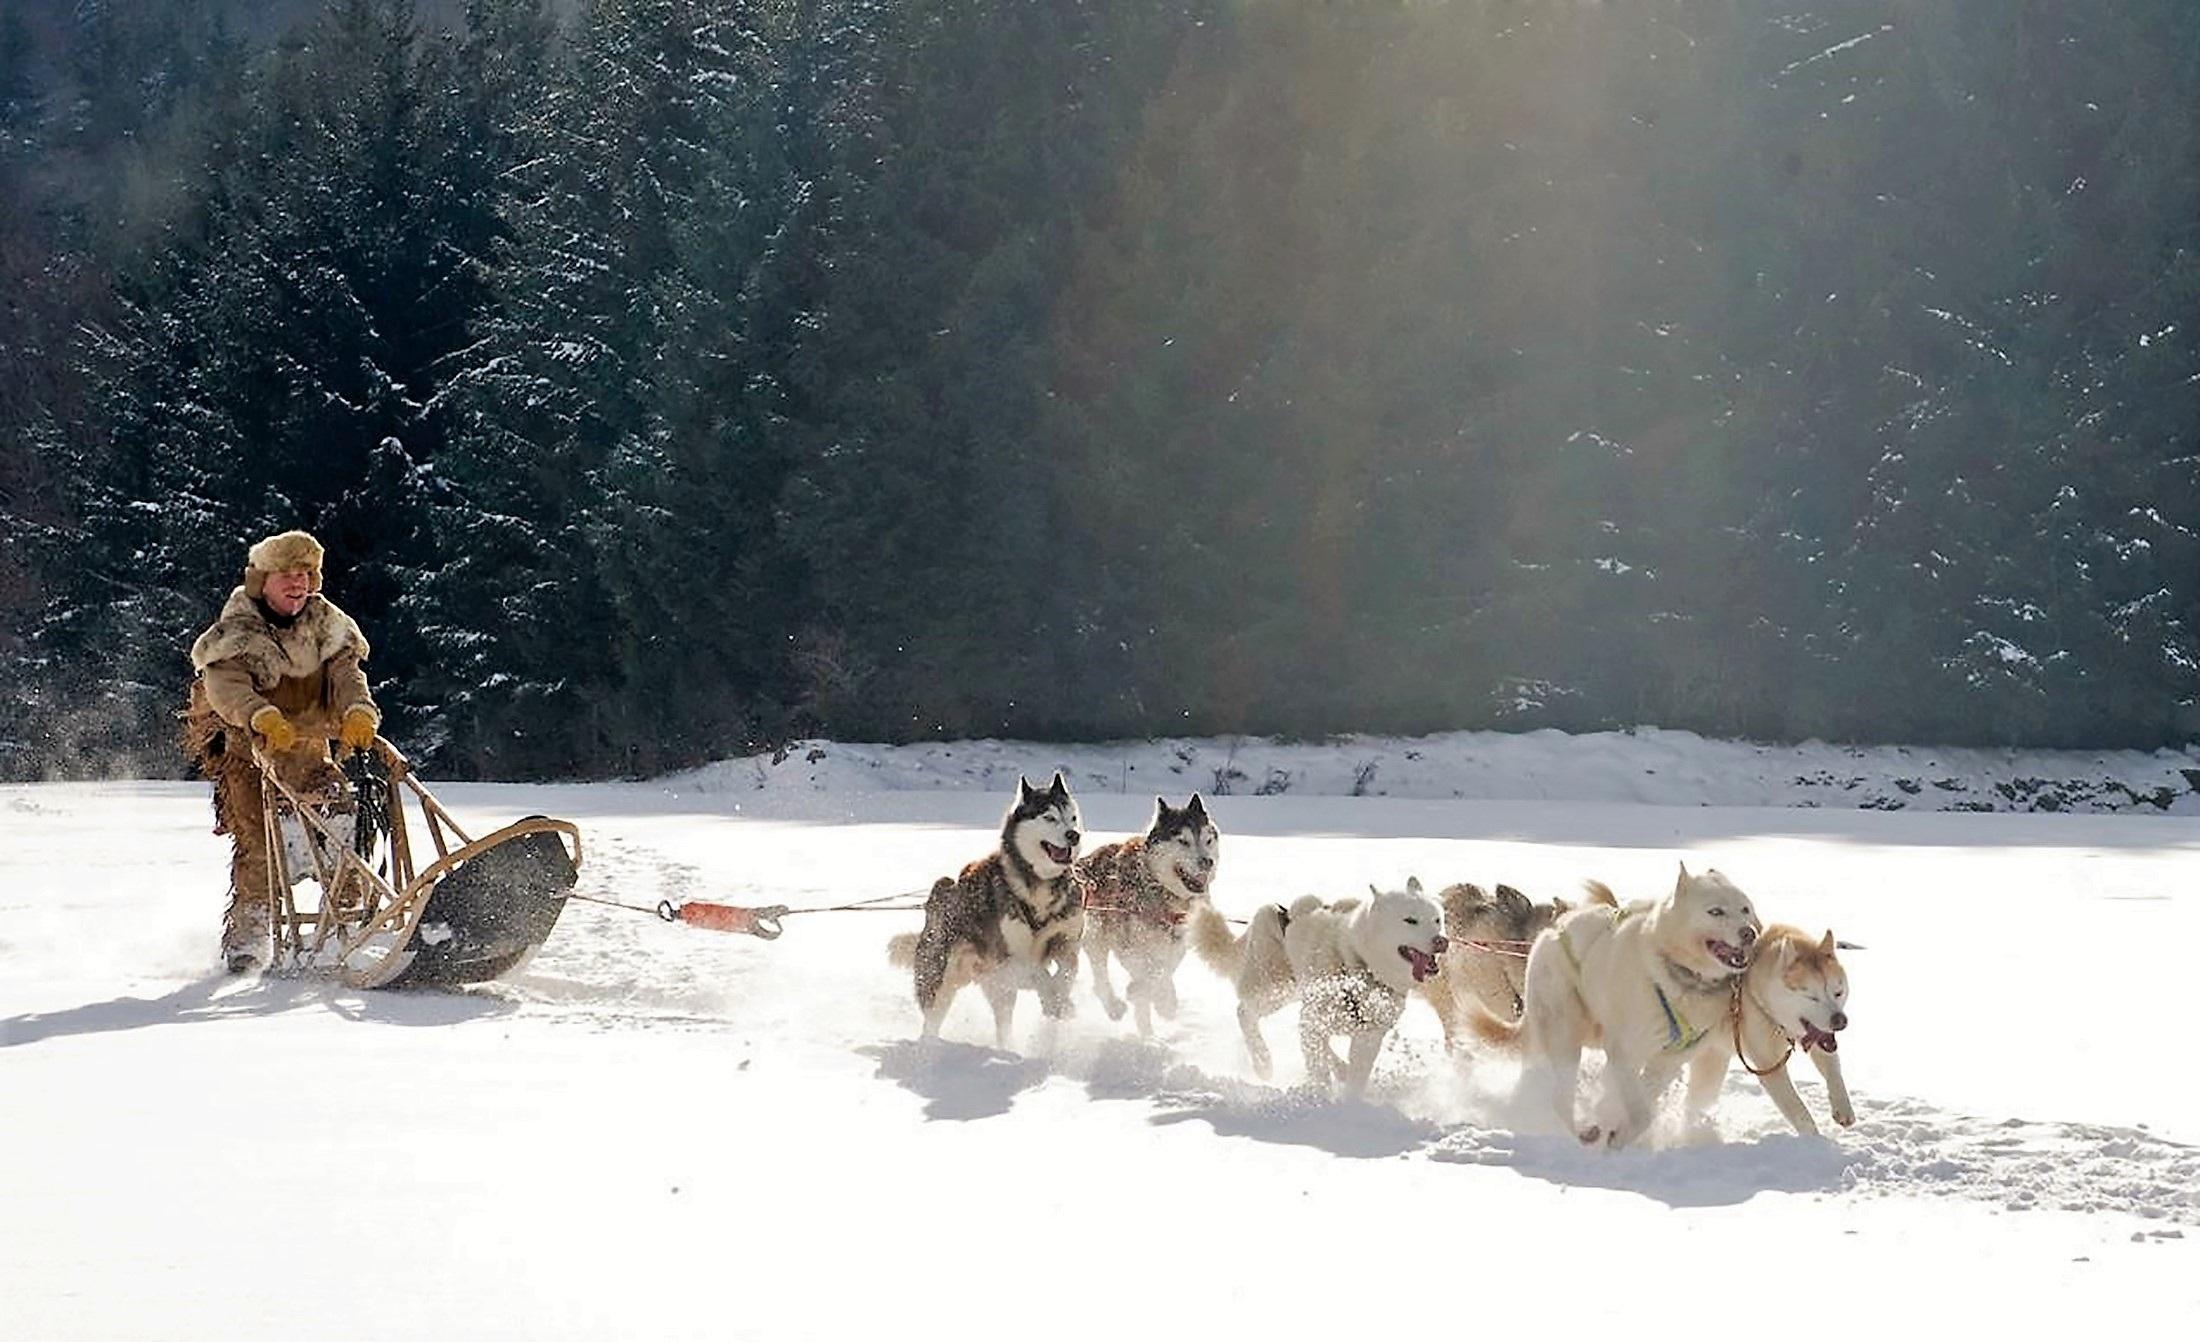 Riding wolf photo